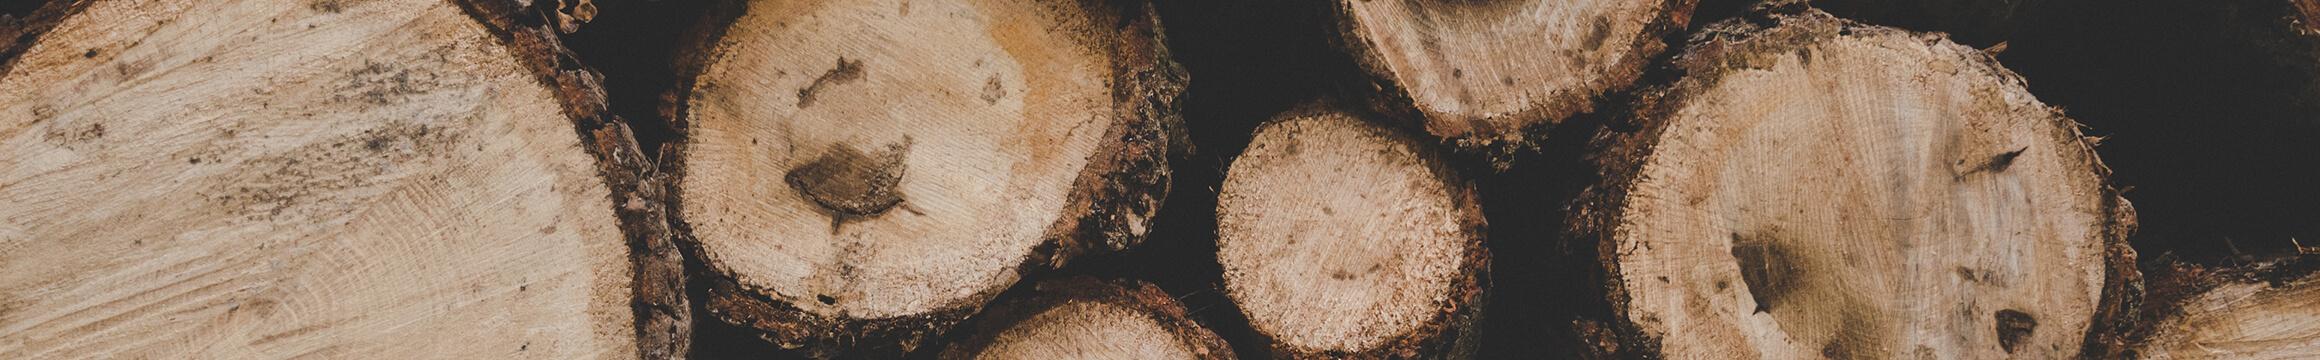 Wood Rustic 05